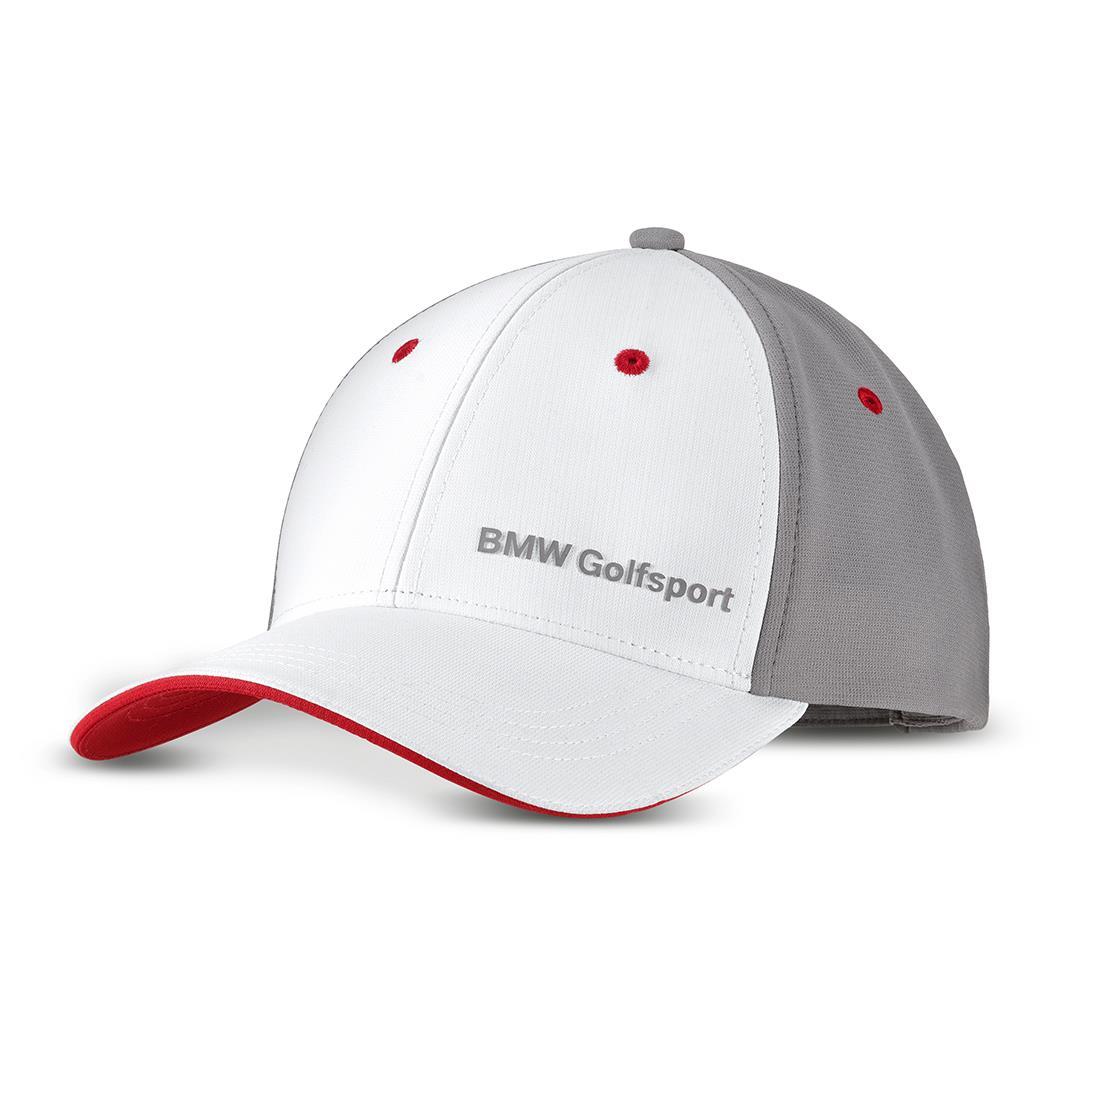 BMW Golfsport Cap